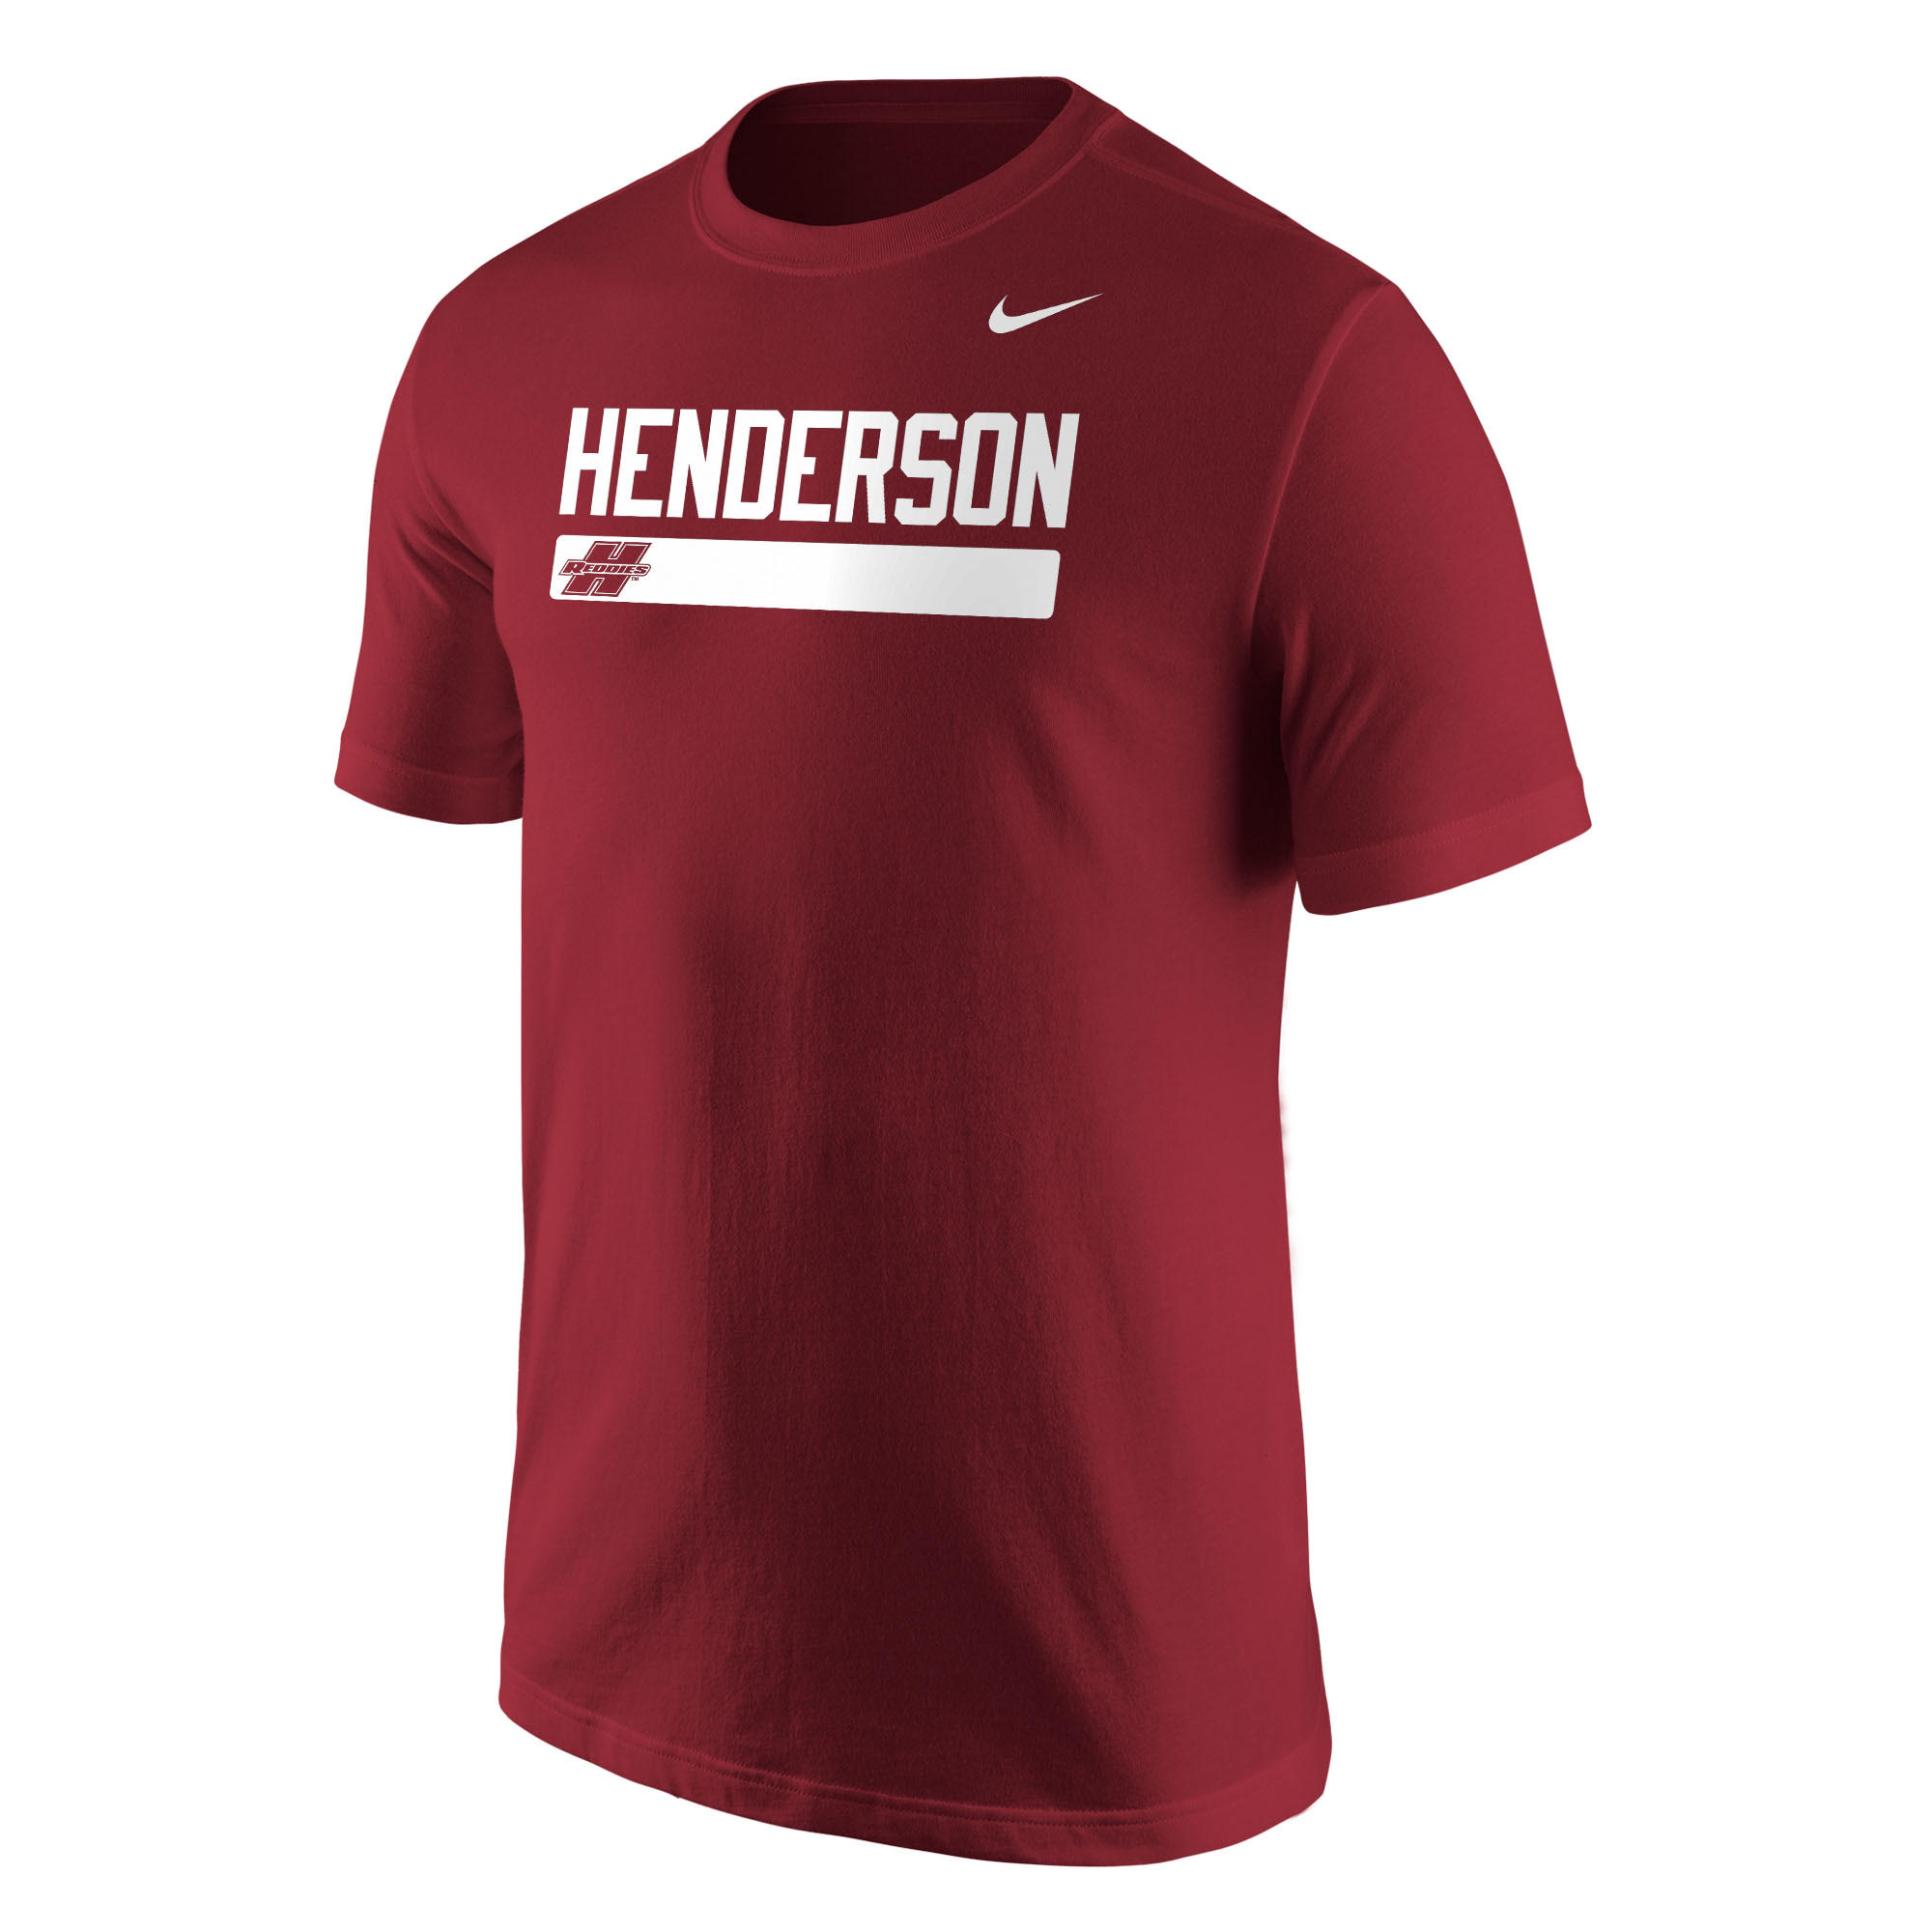 Henderson Reddies Core Short Sleeve T-Shirt